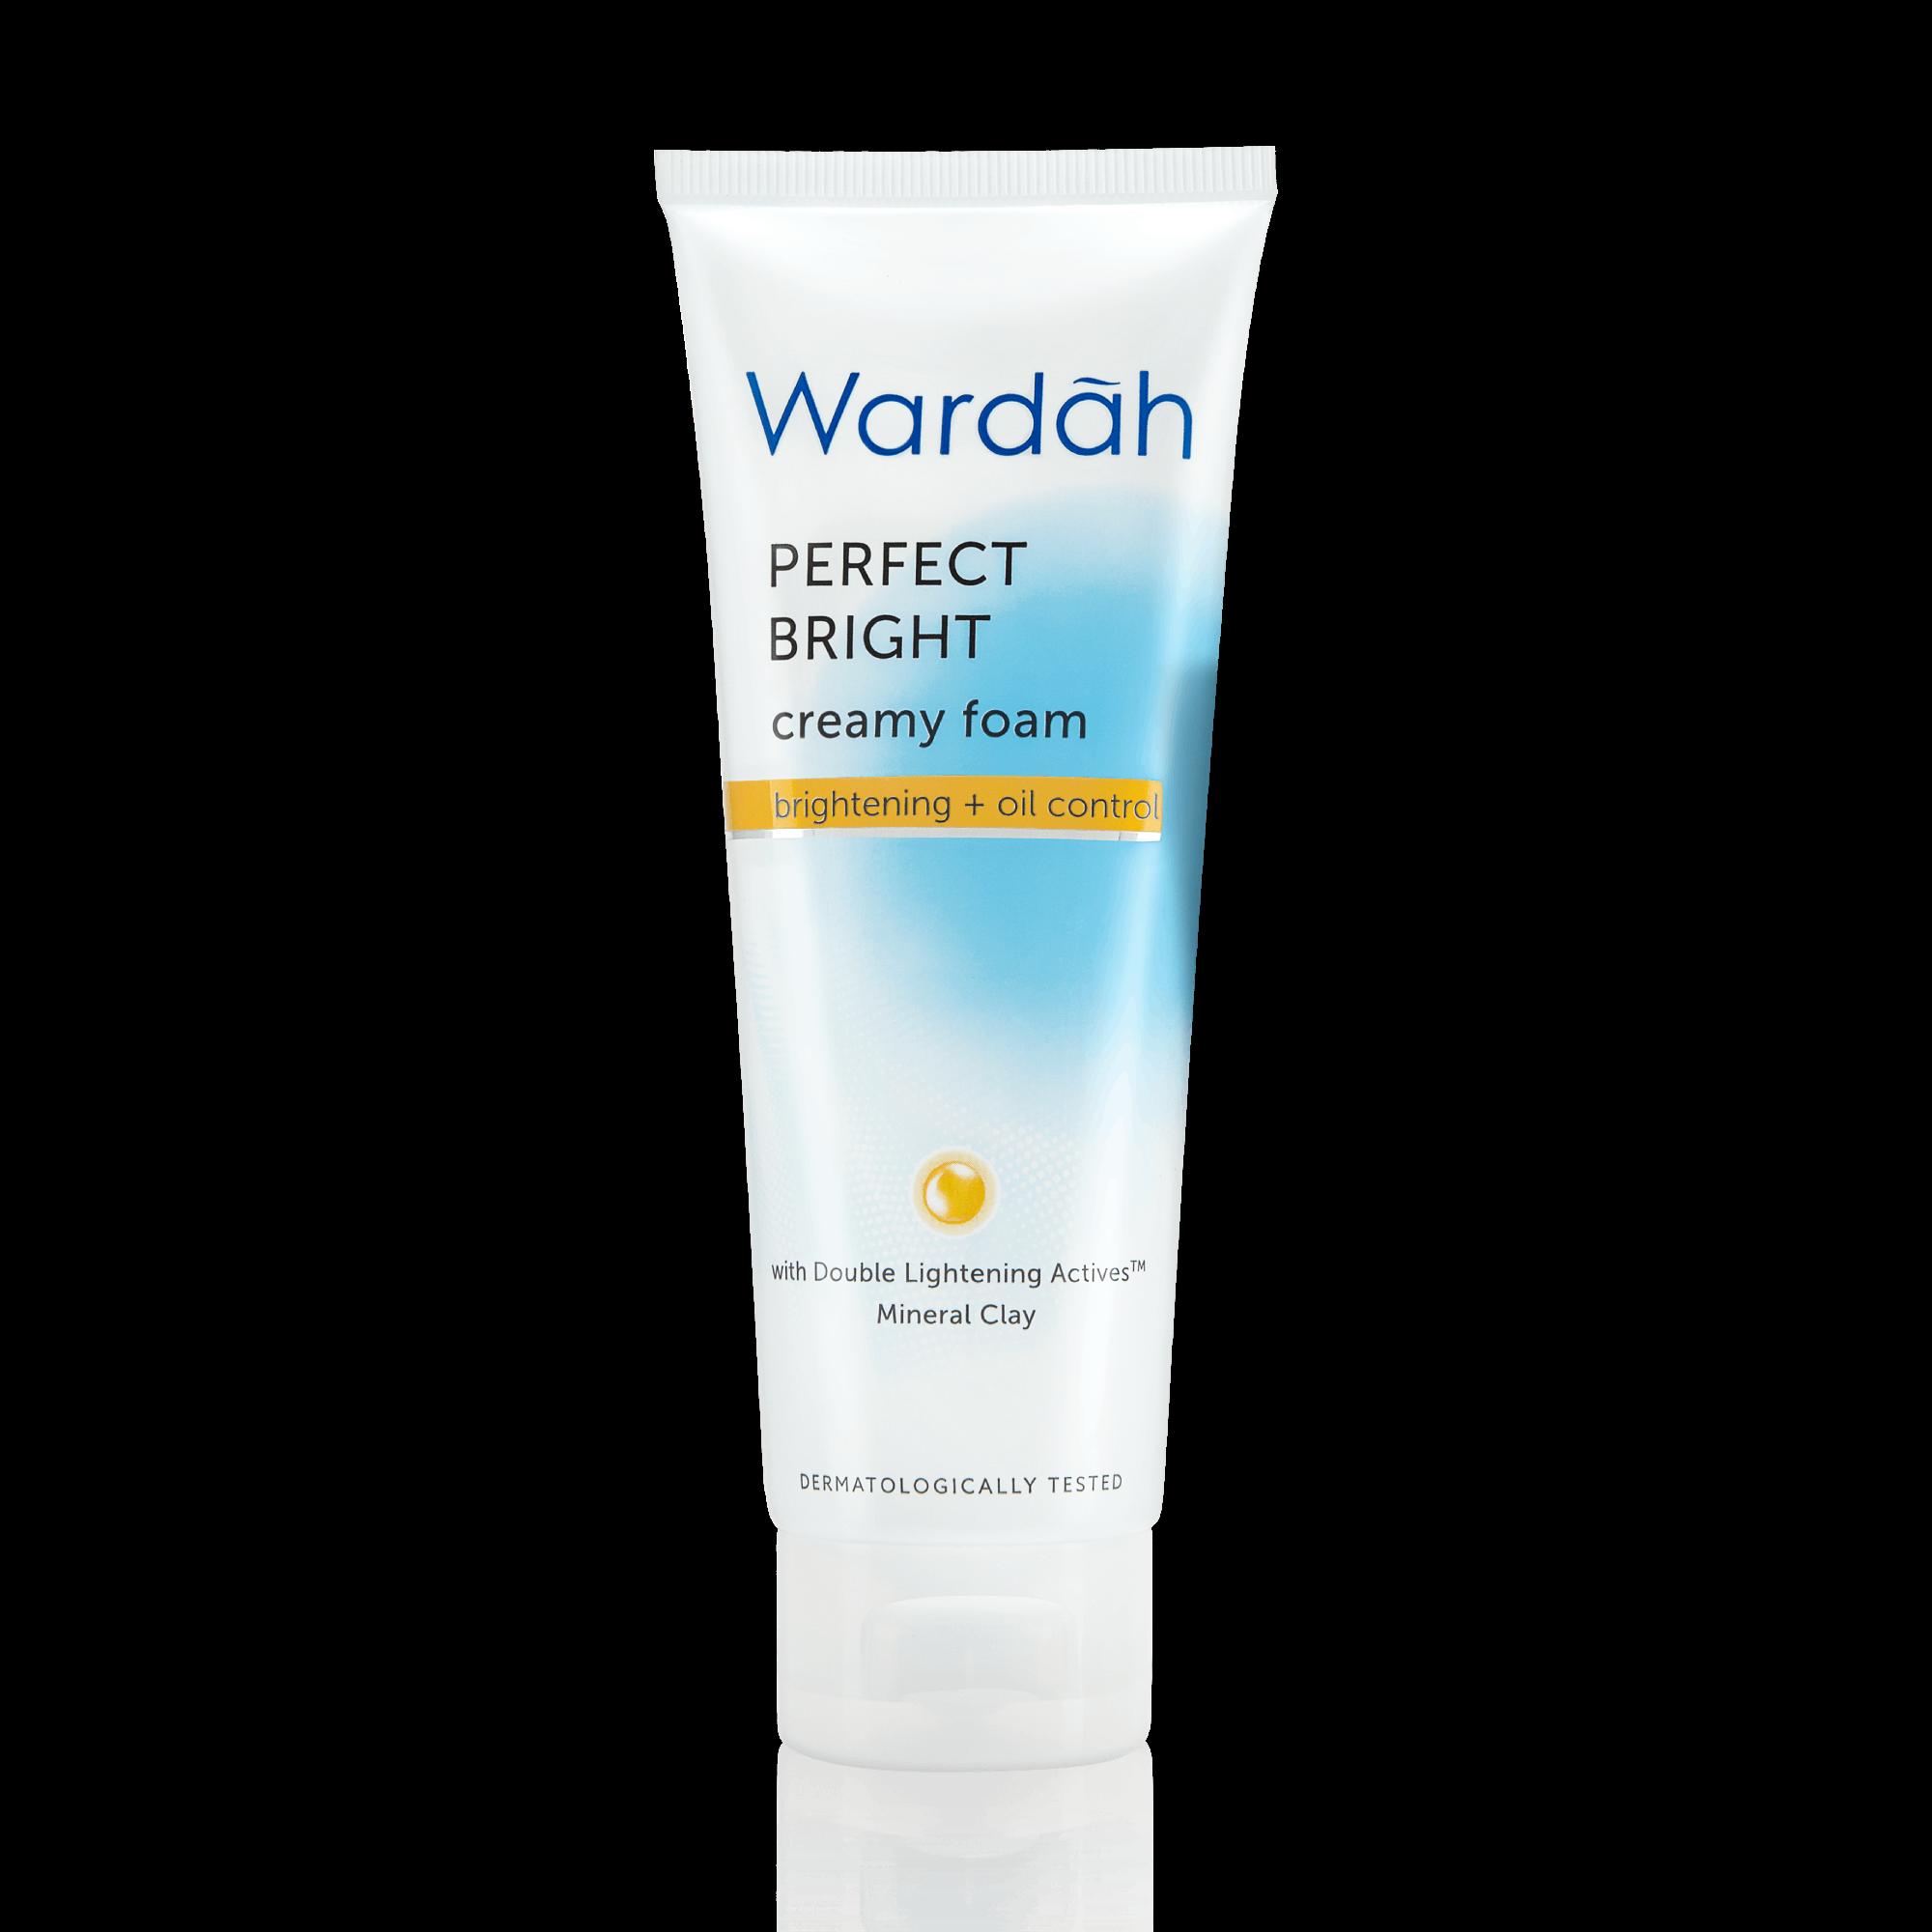 Wardah Perfect Bright Creamy Foam Brightening + Oil Control 100ml